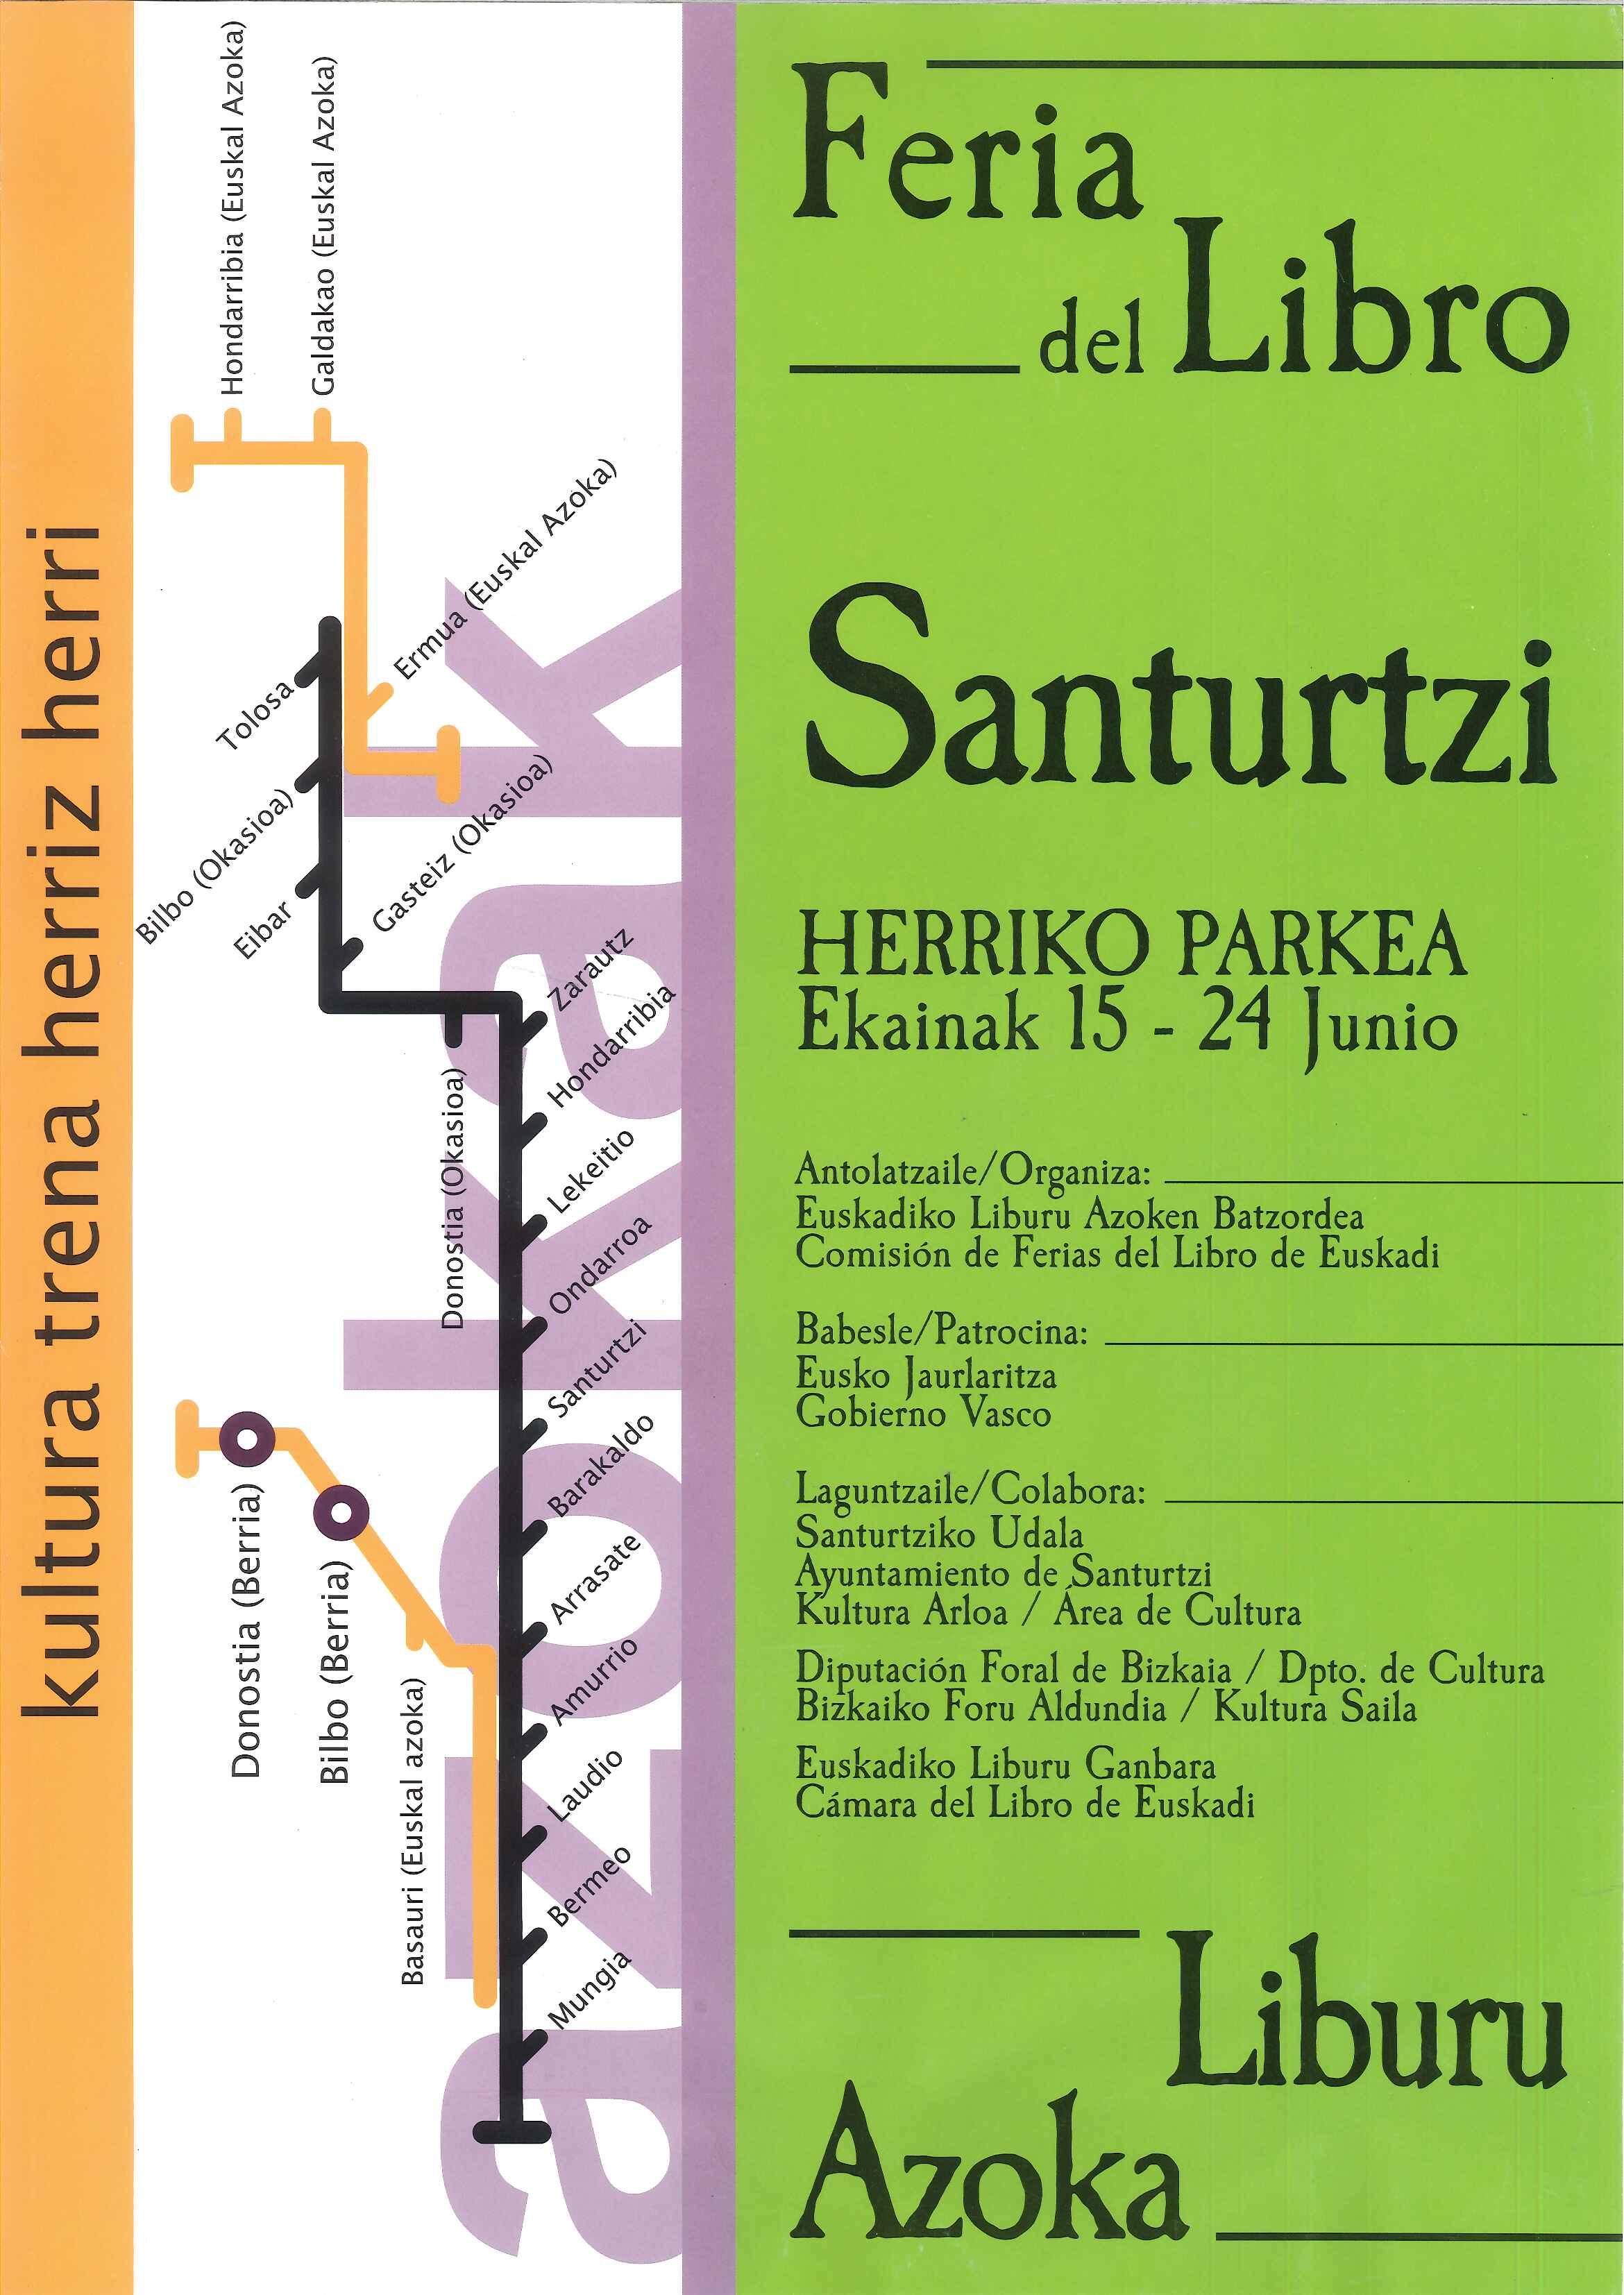 2007 cartel feria libro